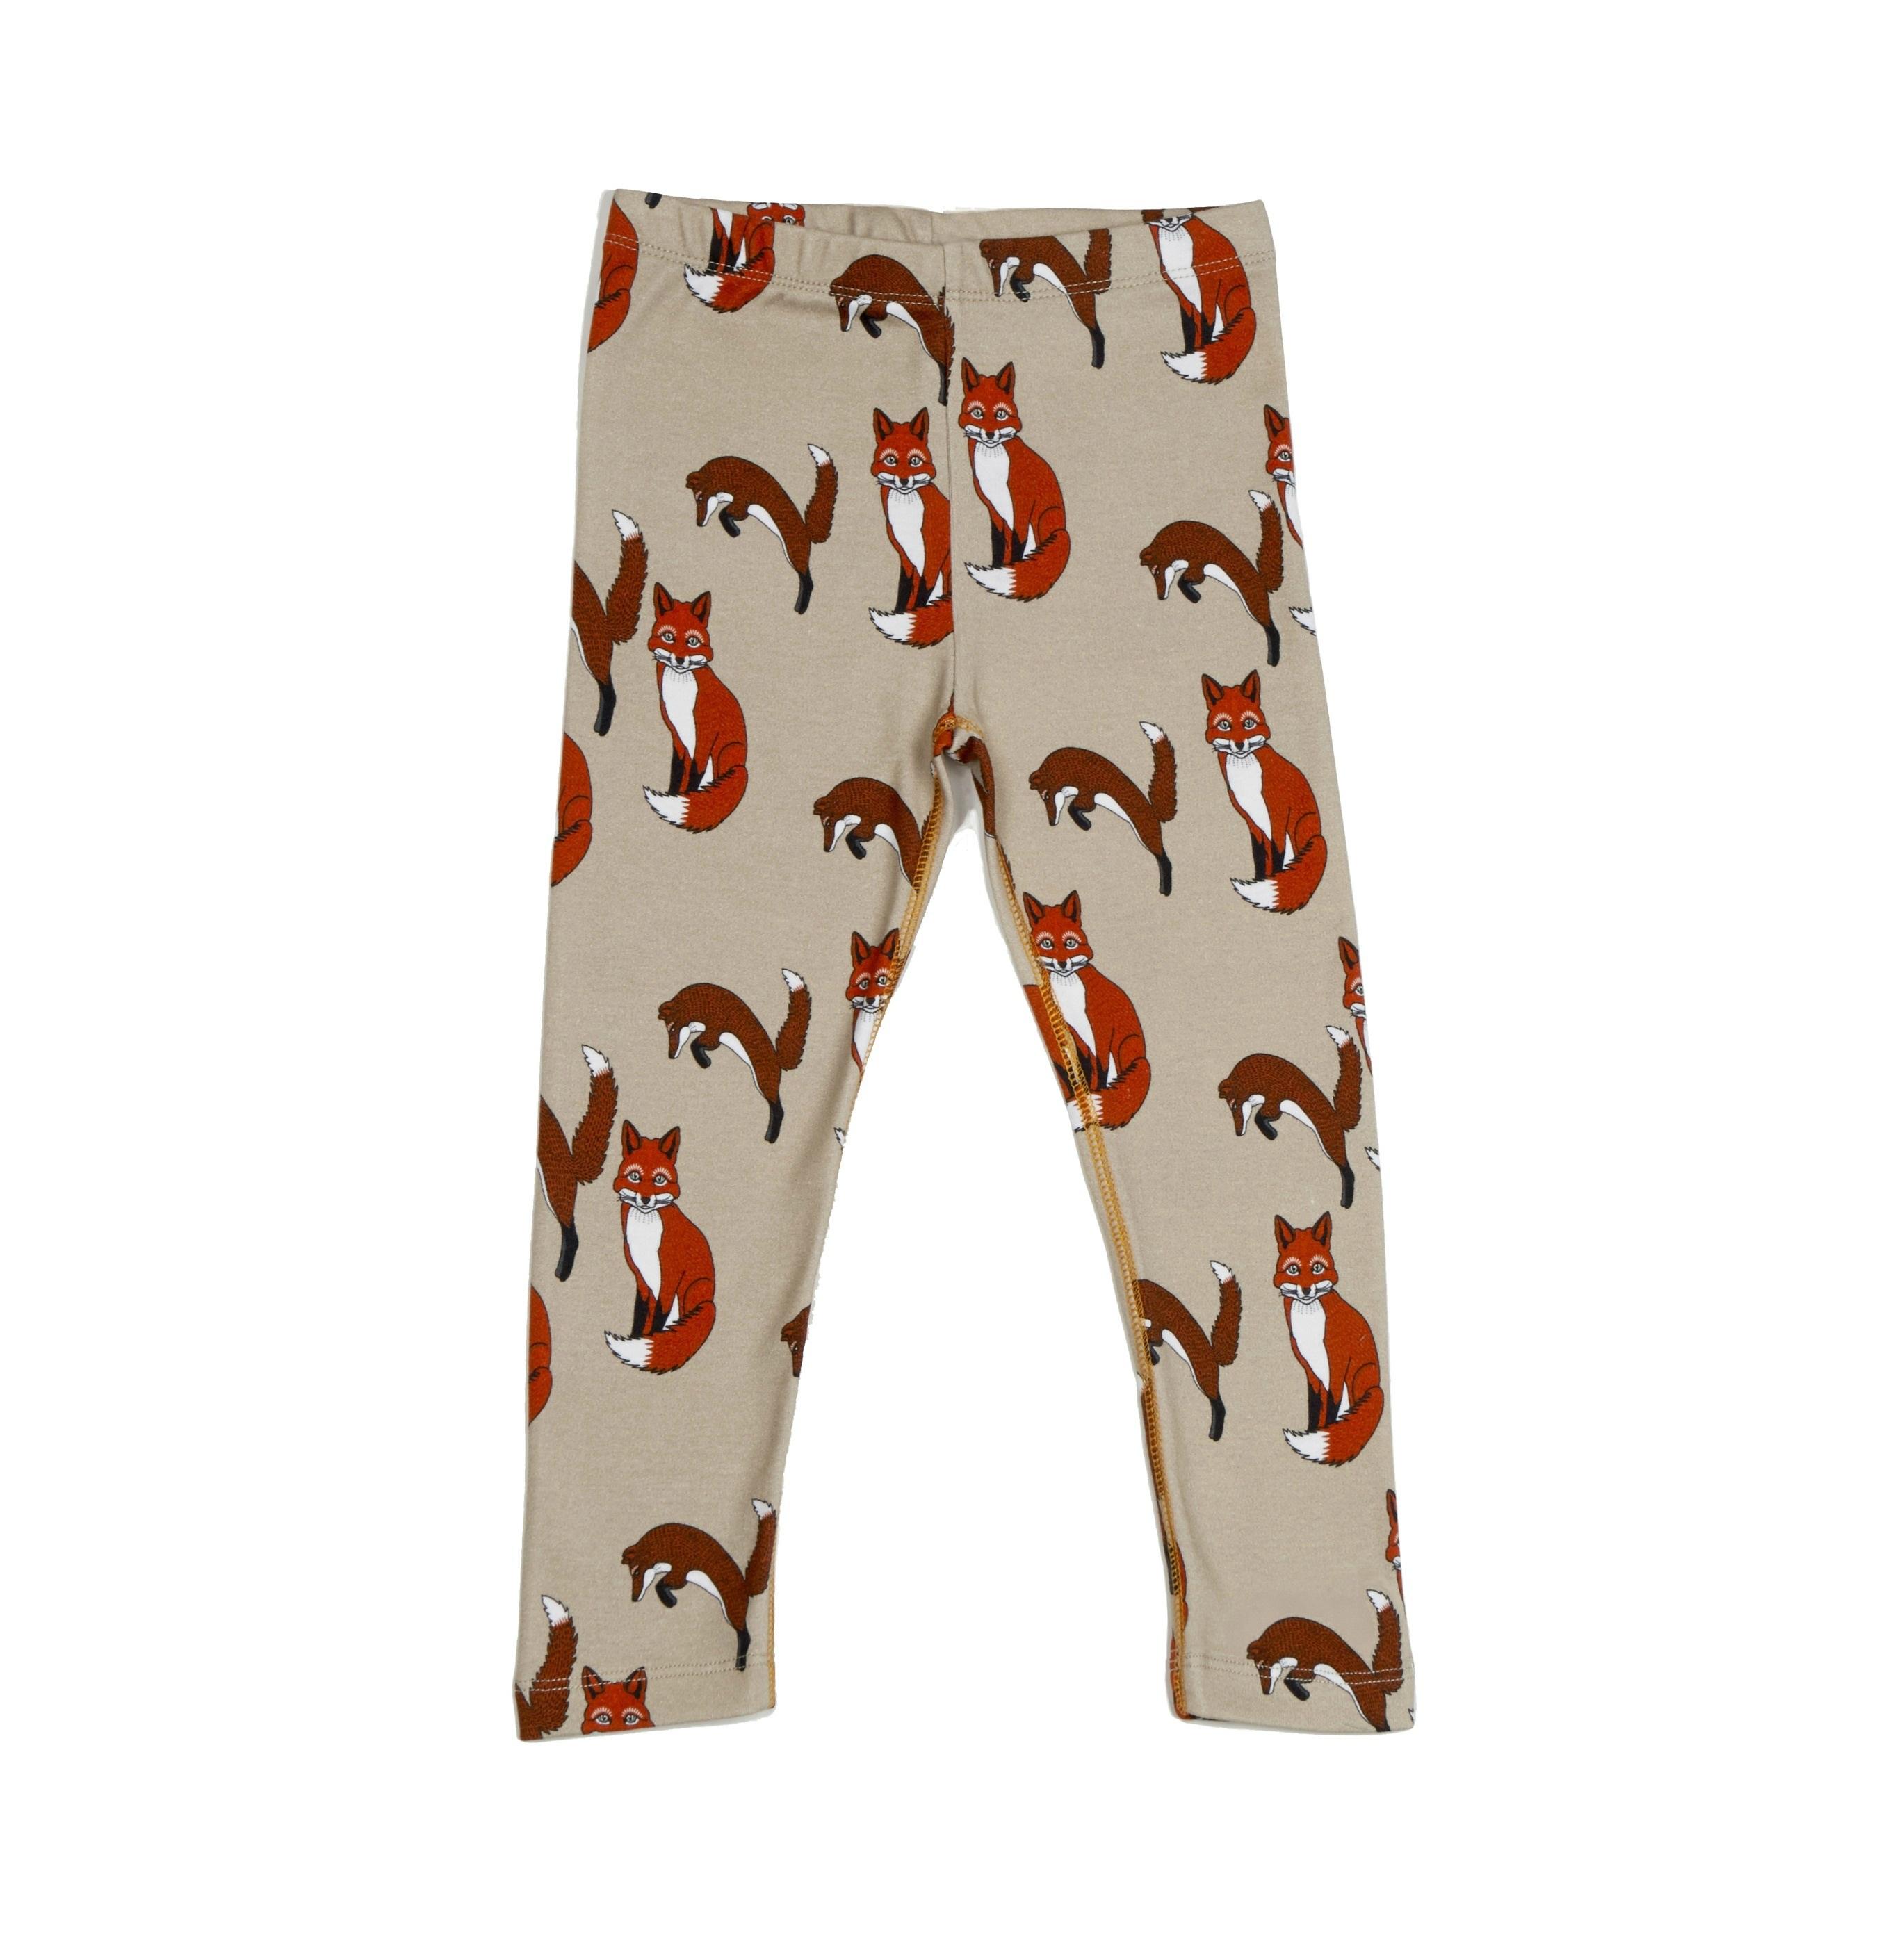 Leggings Foxes AOP AW16